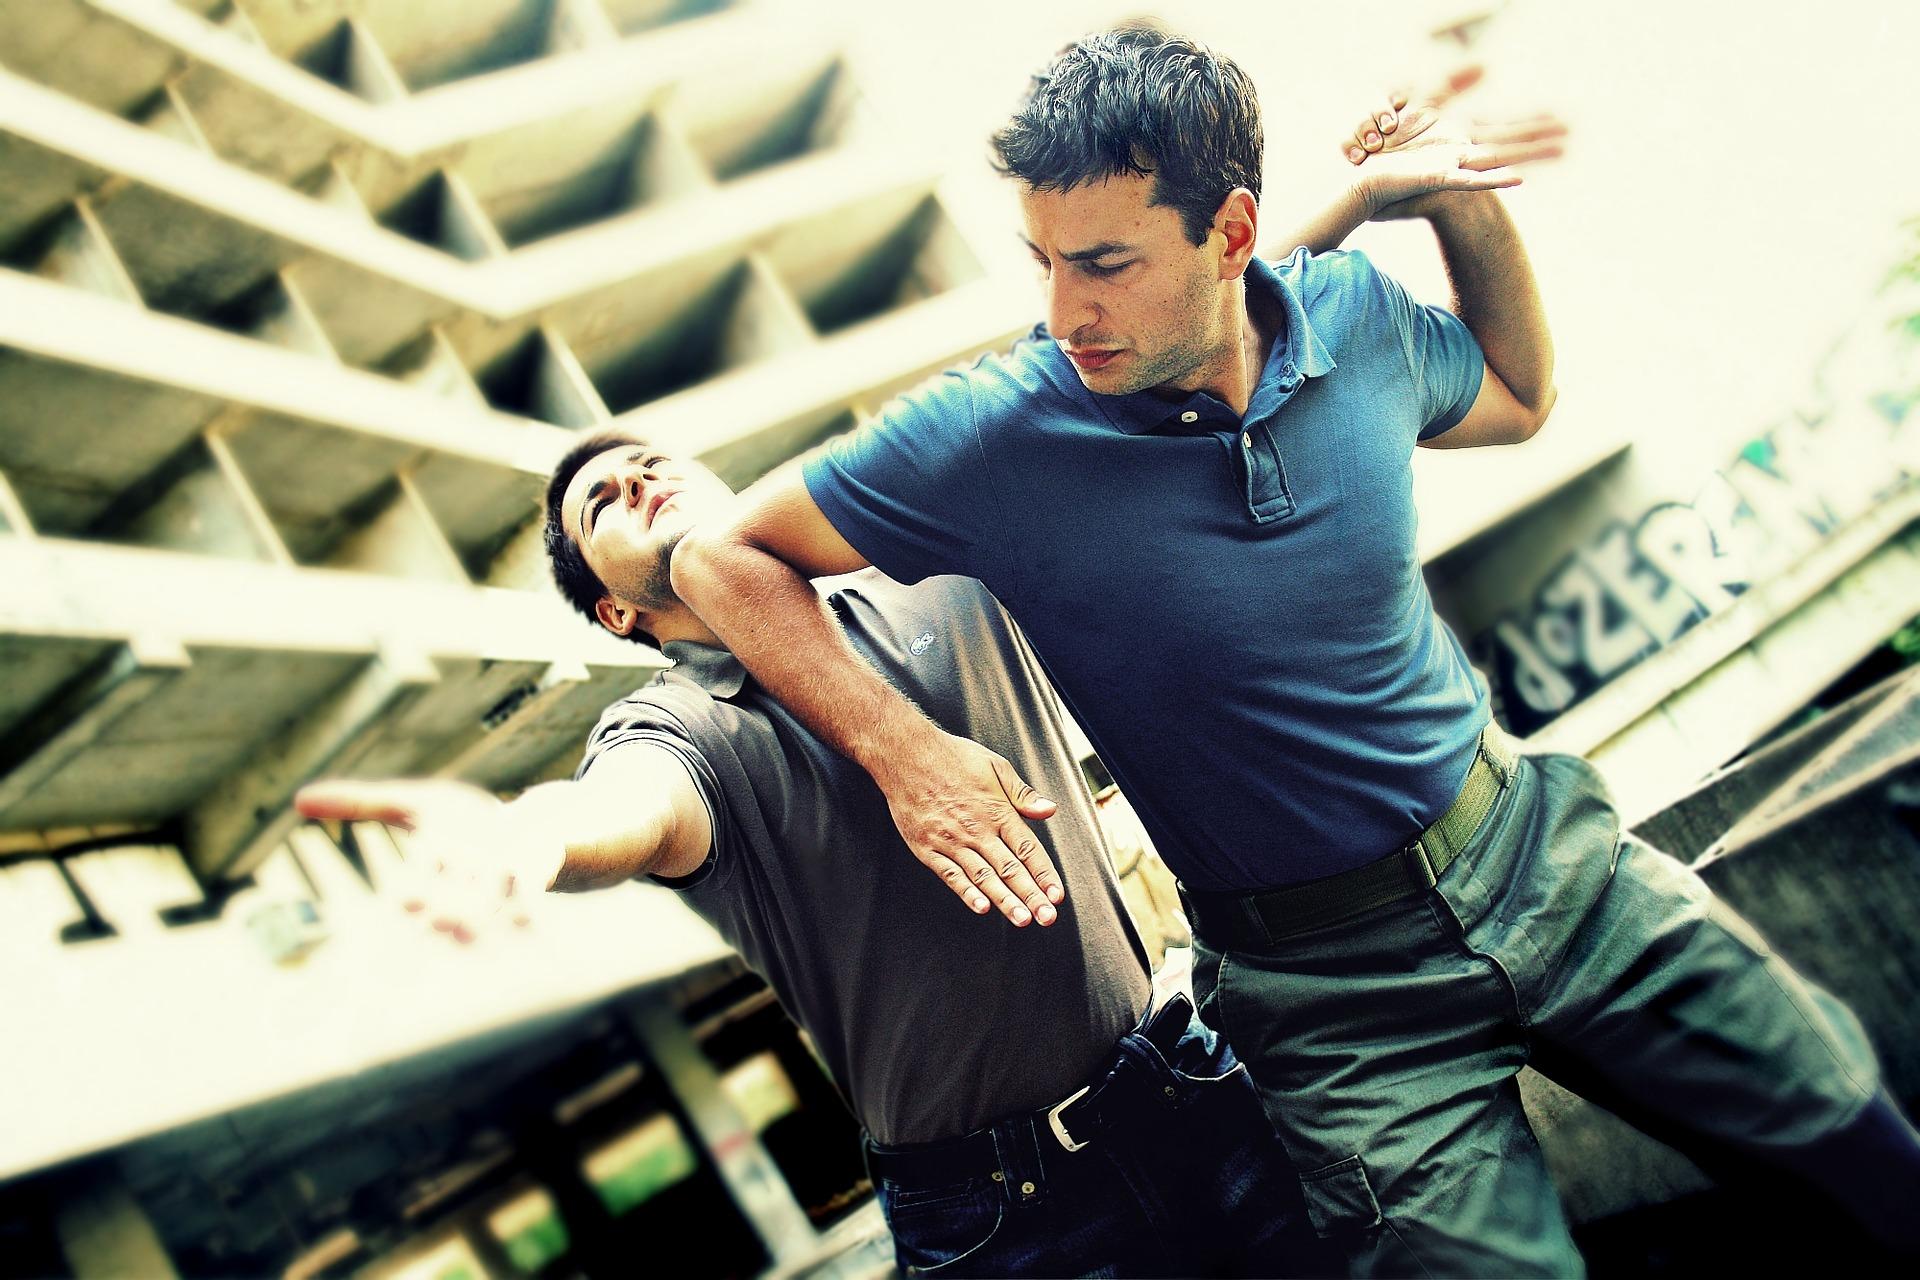 SELF DEFENSE URBAINE DP/ACADEMY